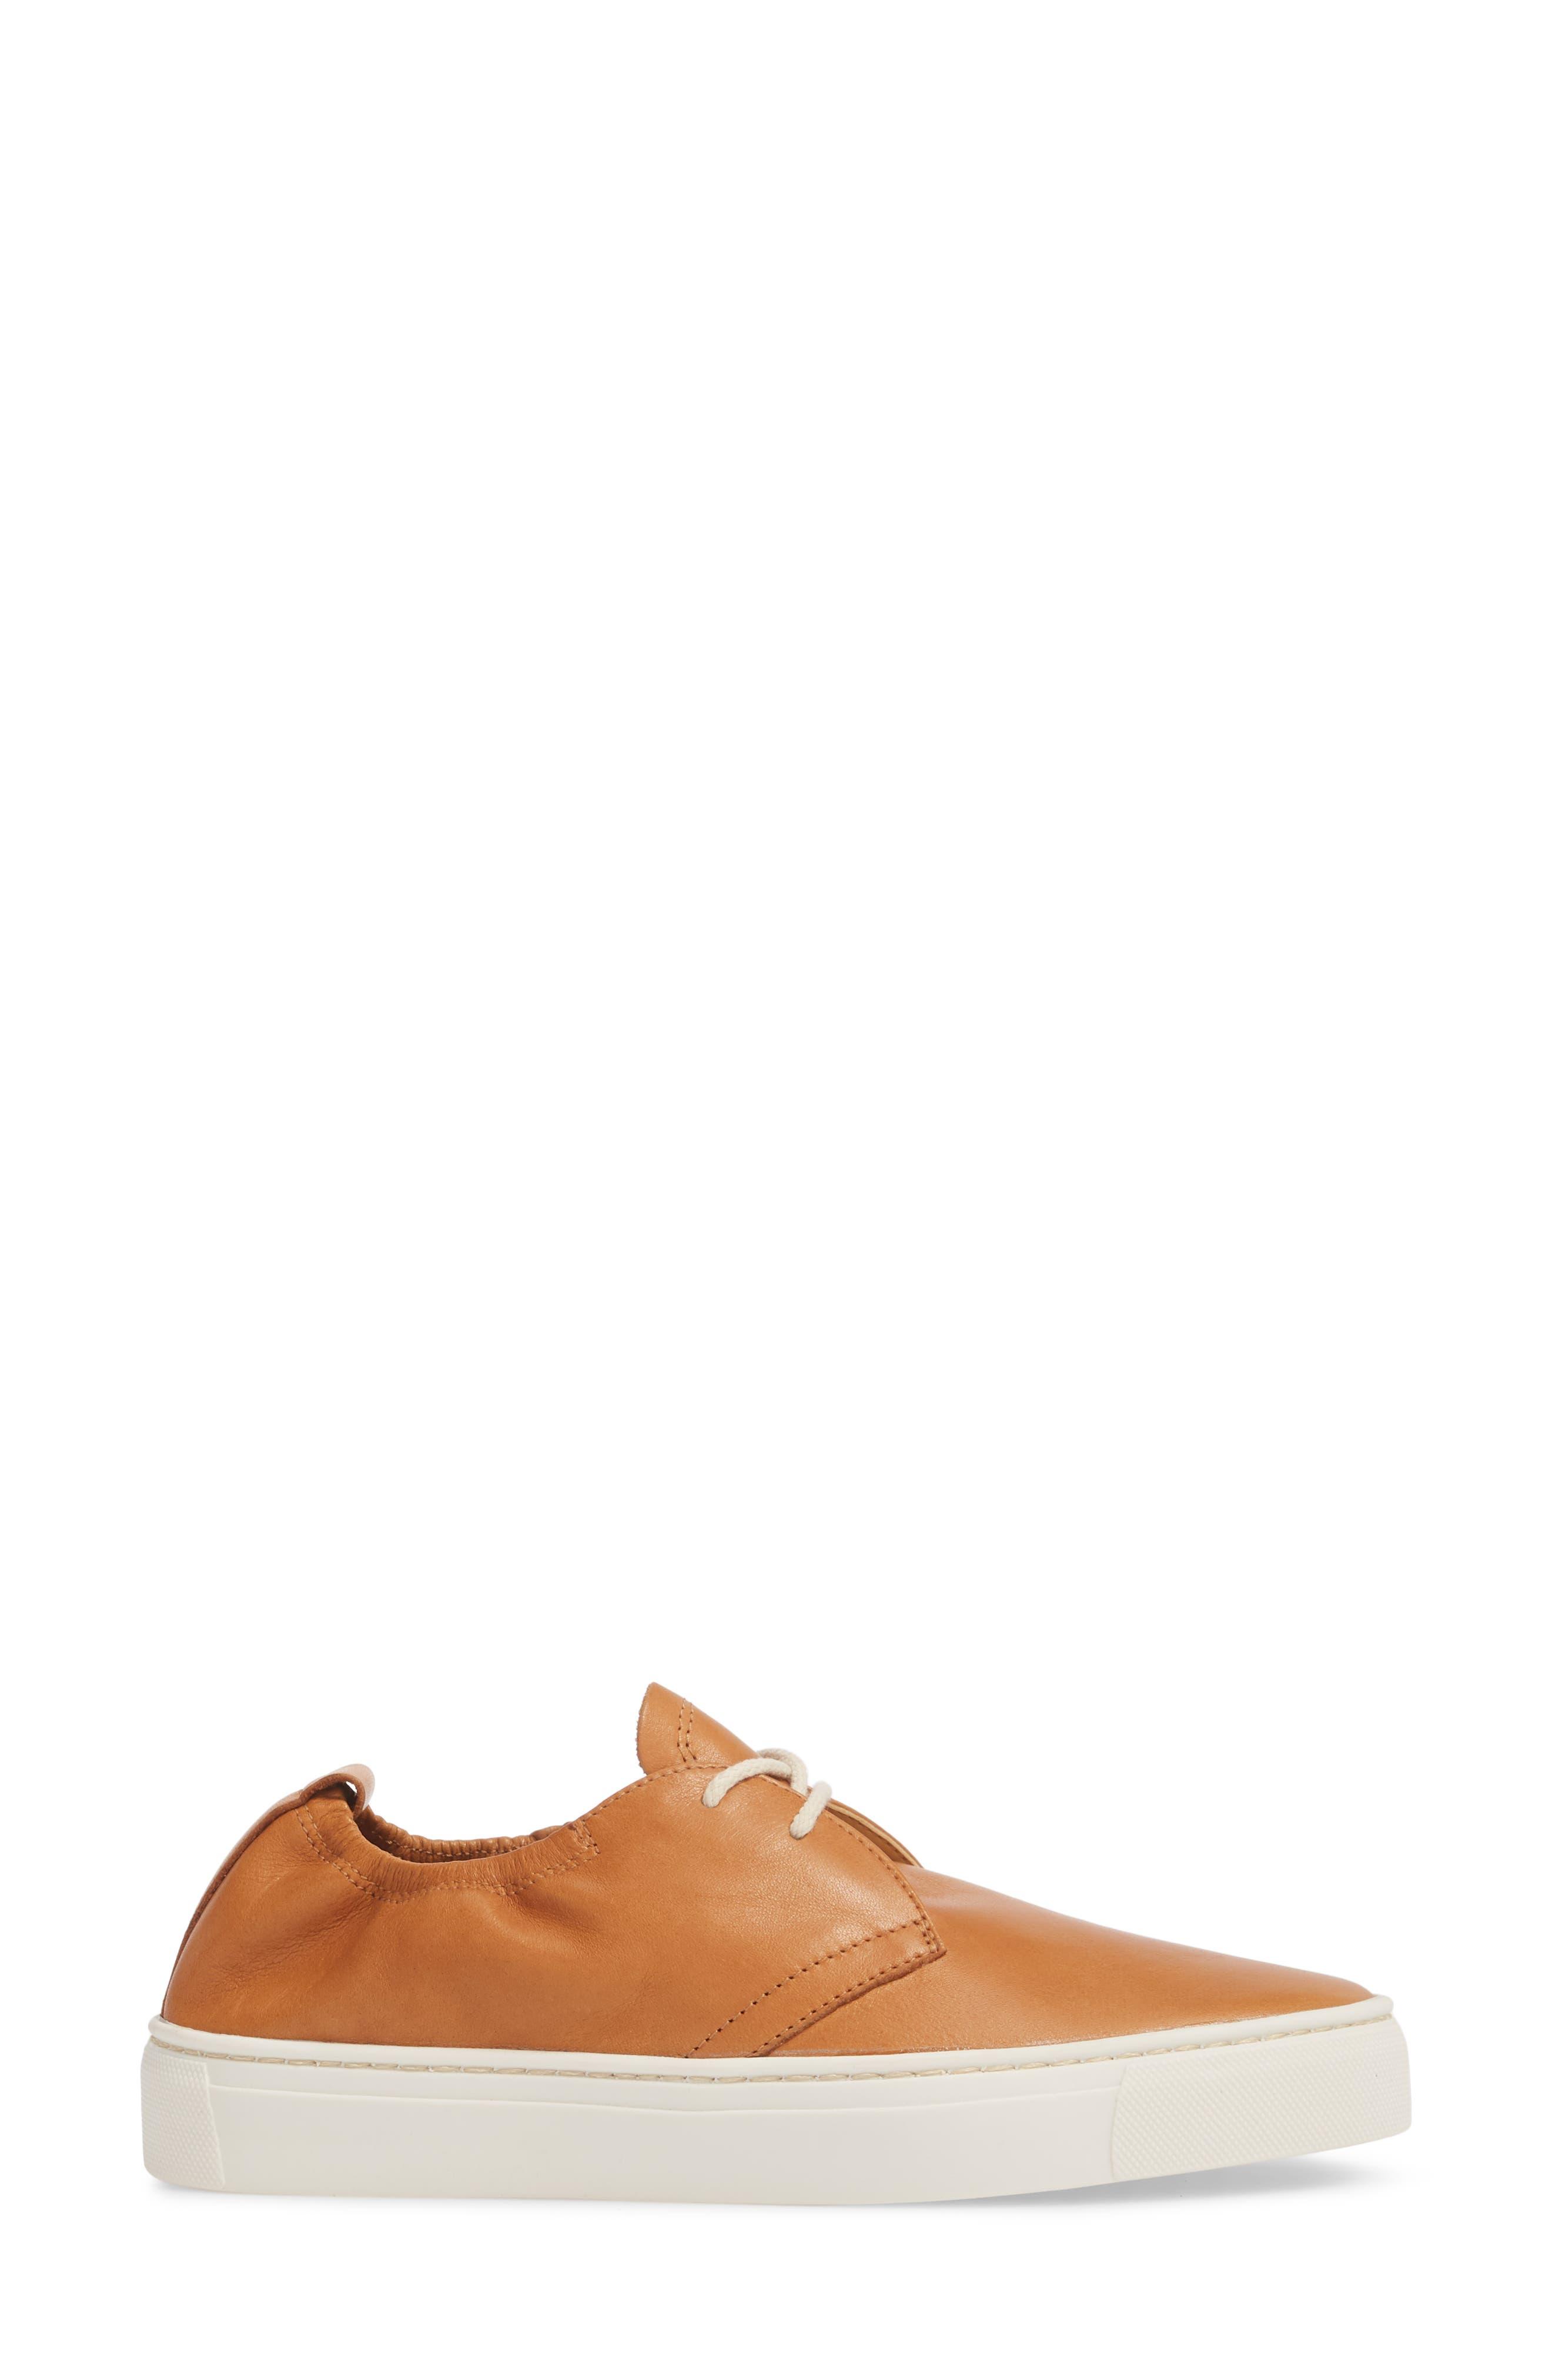 Sneak Up Sneaker,                             Alternate thumbnail 3, color,                             Cognac Leather